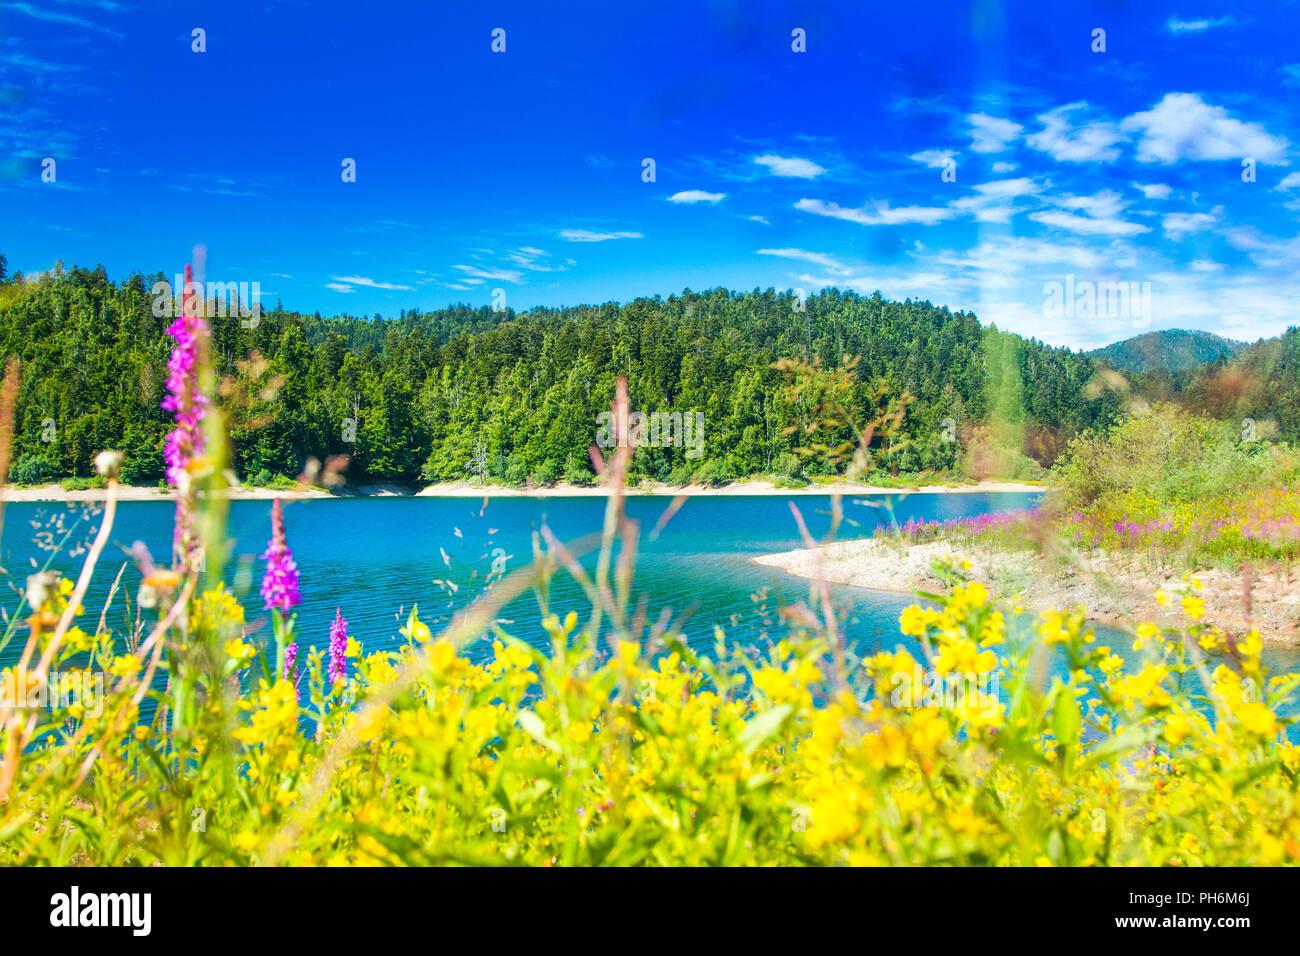 Beautiful blue Lokvarsko lake in colorful mountain landscape, Lokve, Gorski kotar, Croatia Stock Photo